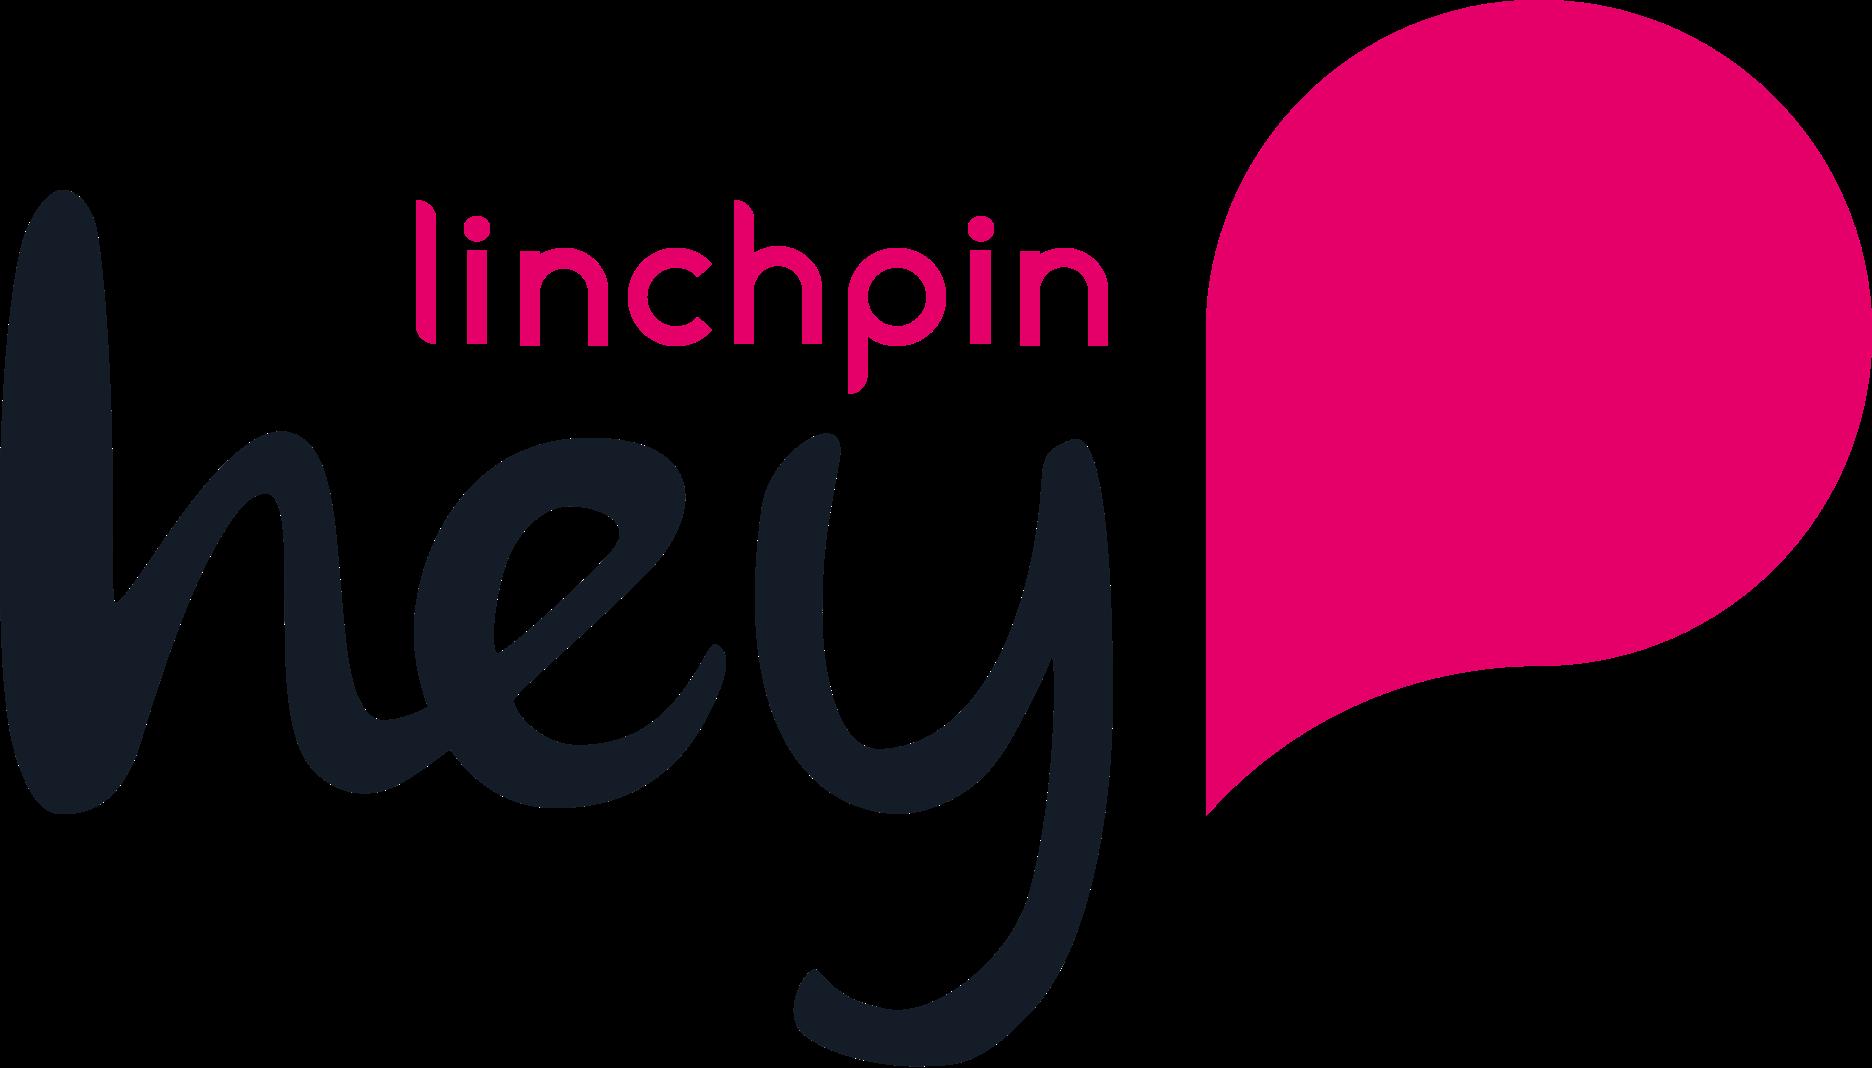 linchpin-hey